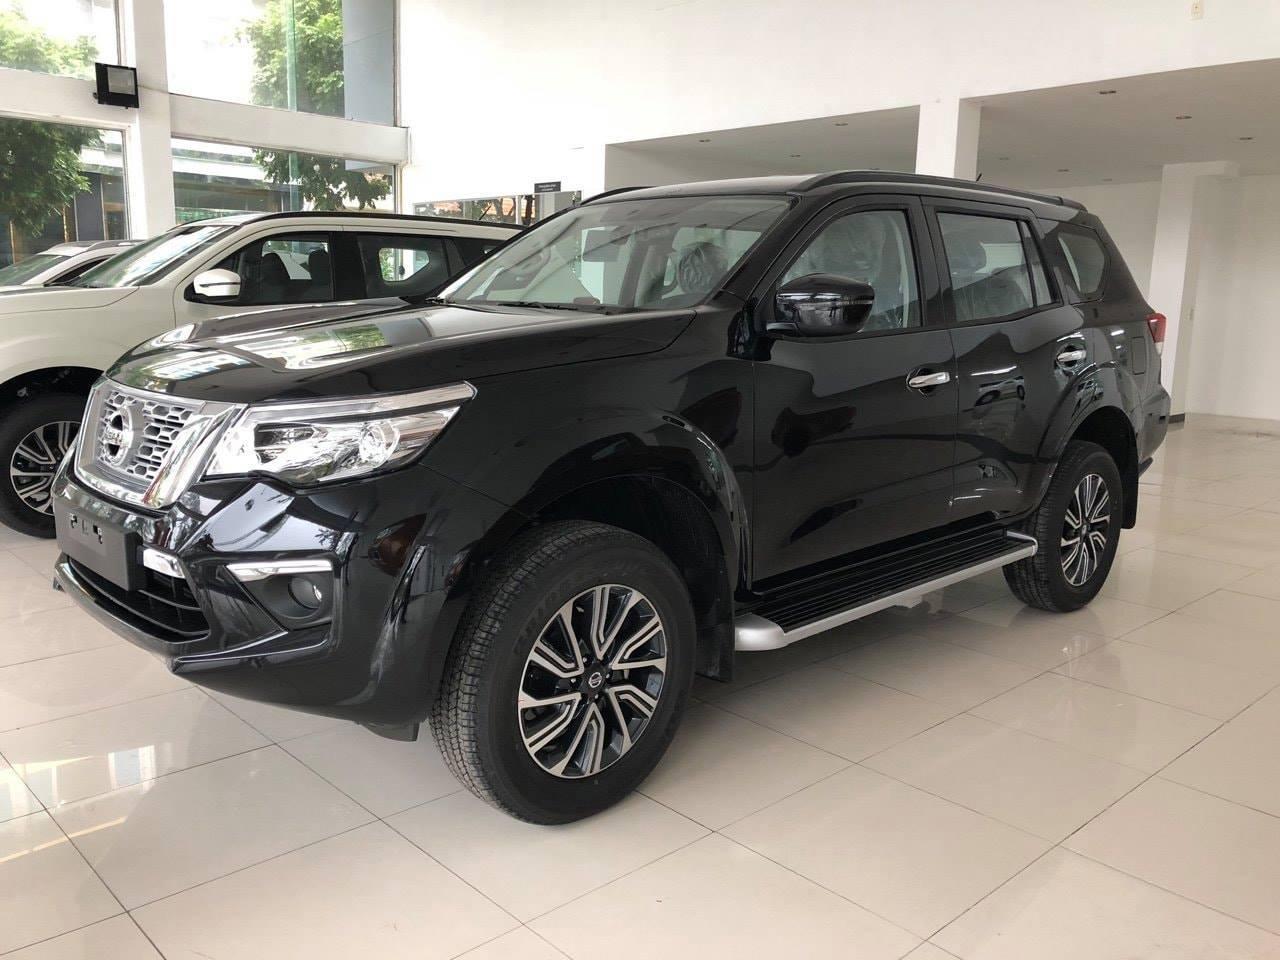 Hyundai Santa Fe 2019,Toyota Fortuner,Nissan Terra,so sánh xe